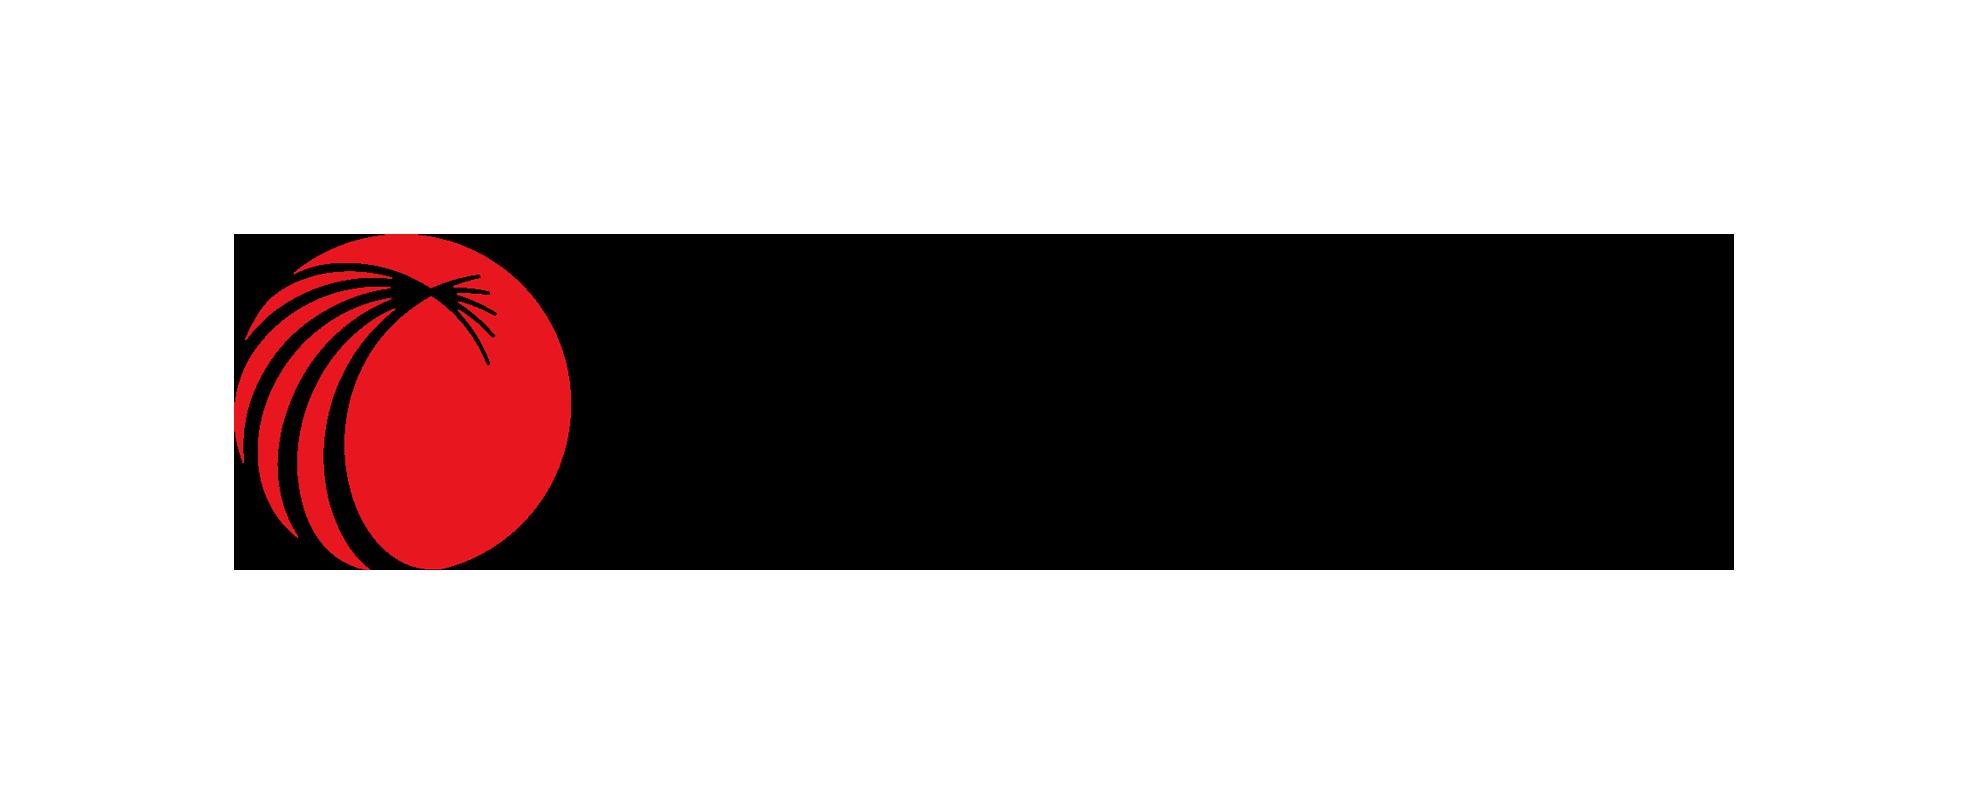 LexisNexis logo Yorkshire Legal Awards 2019